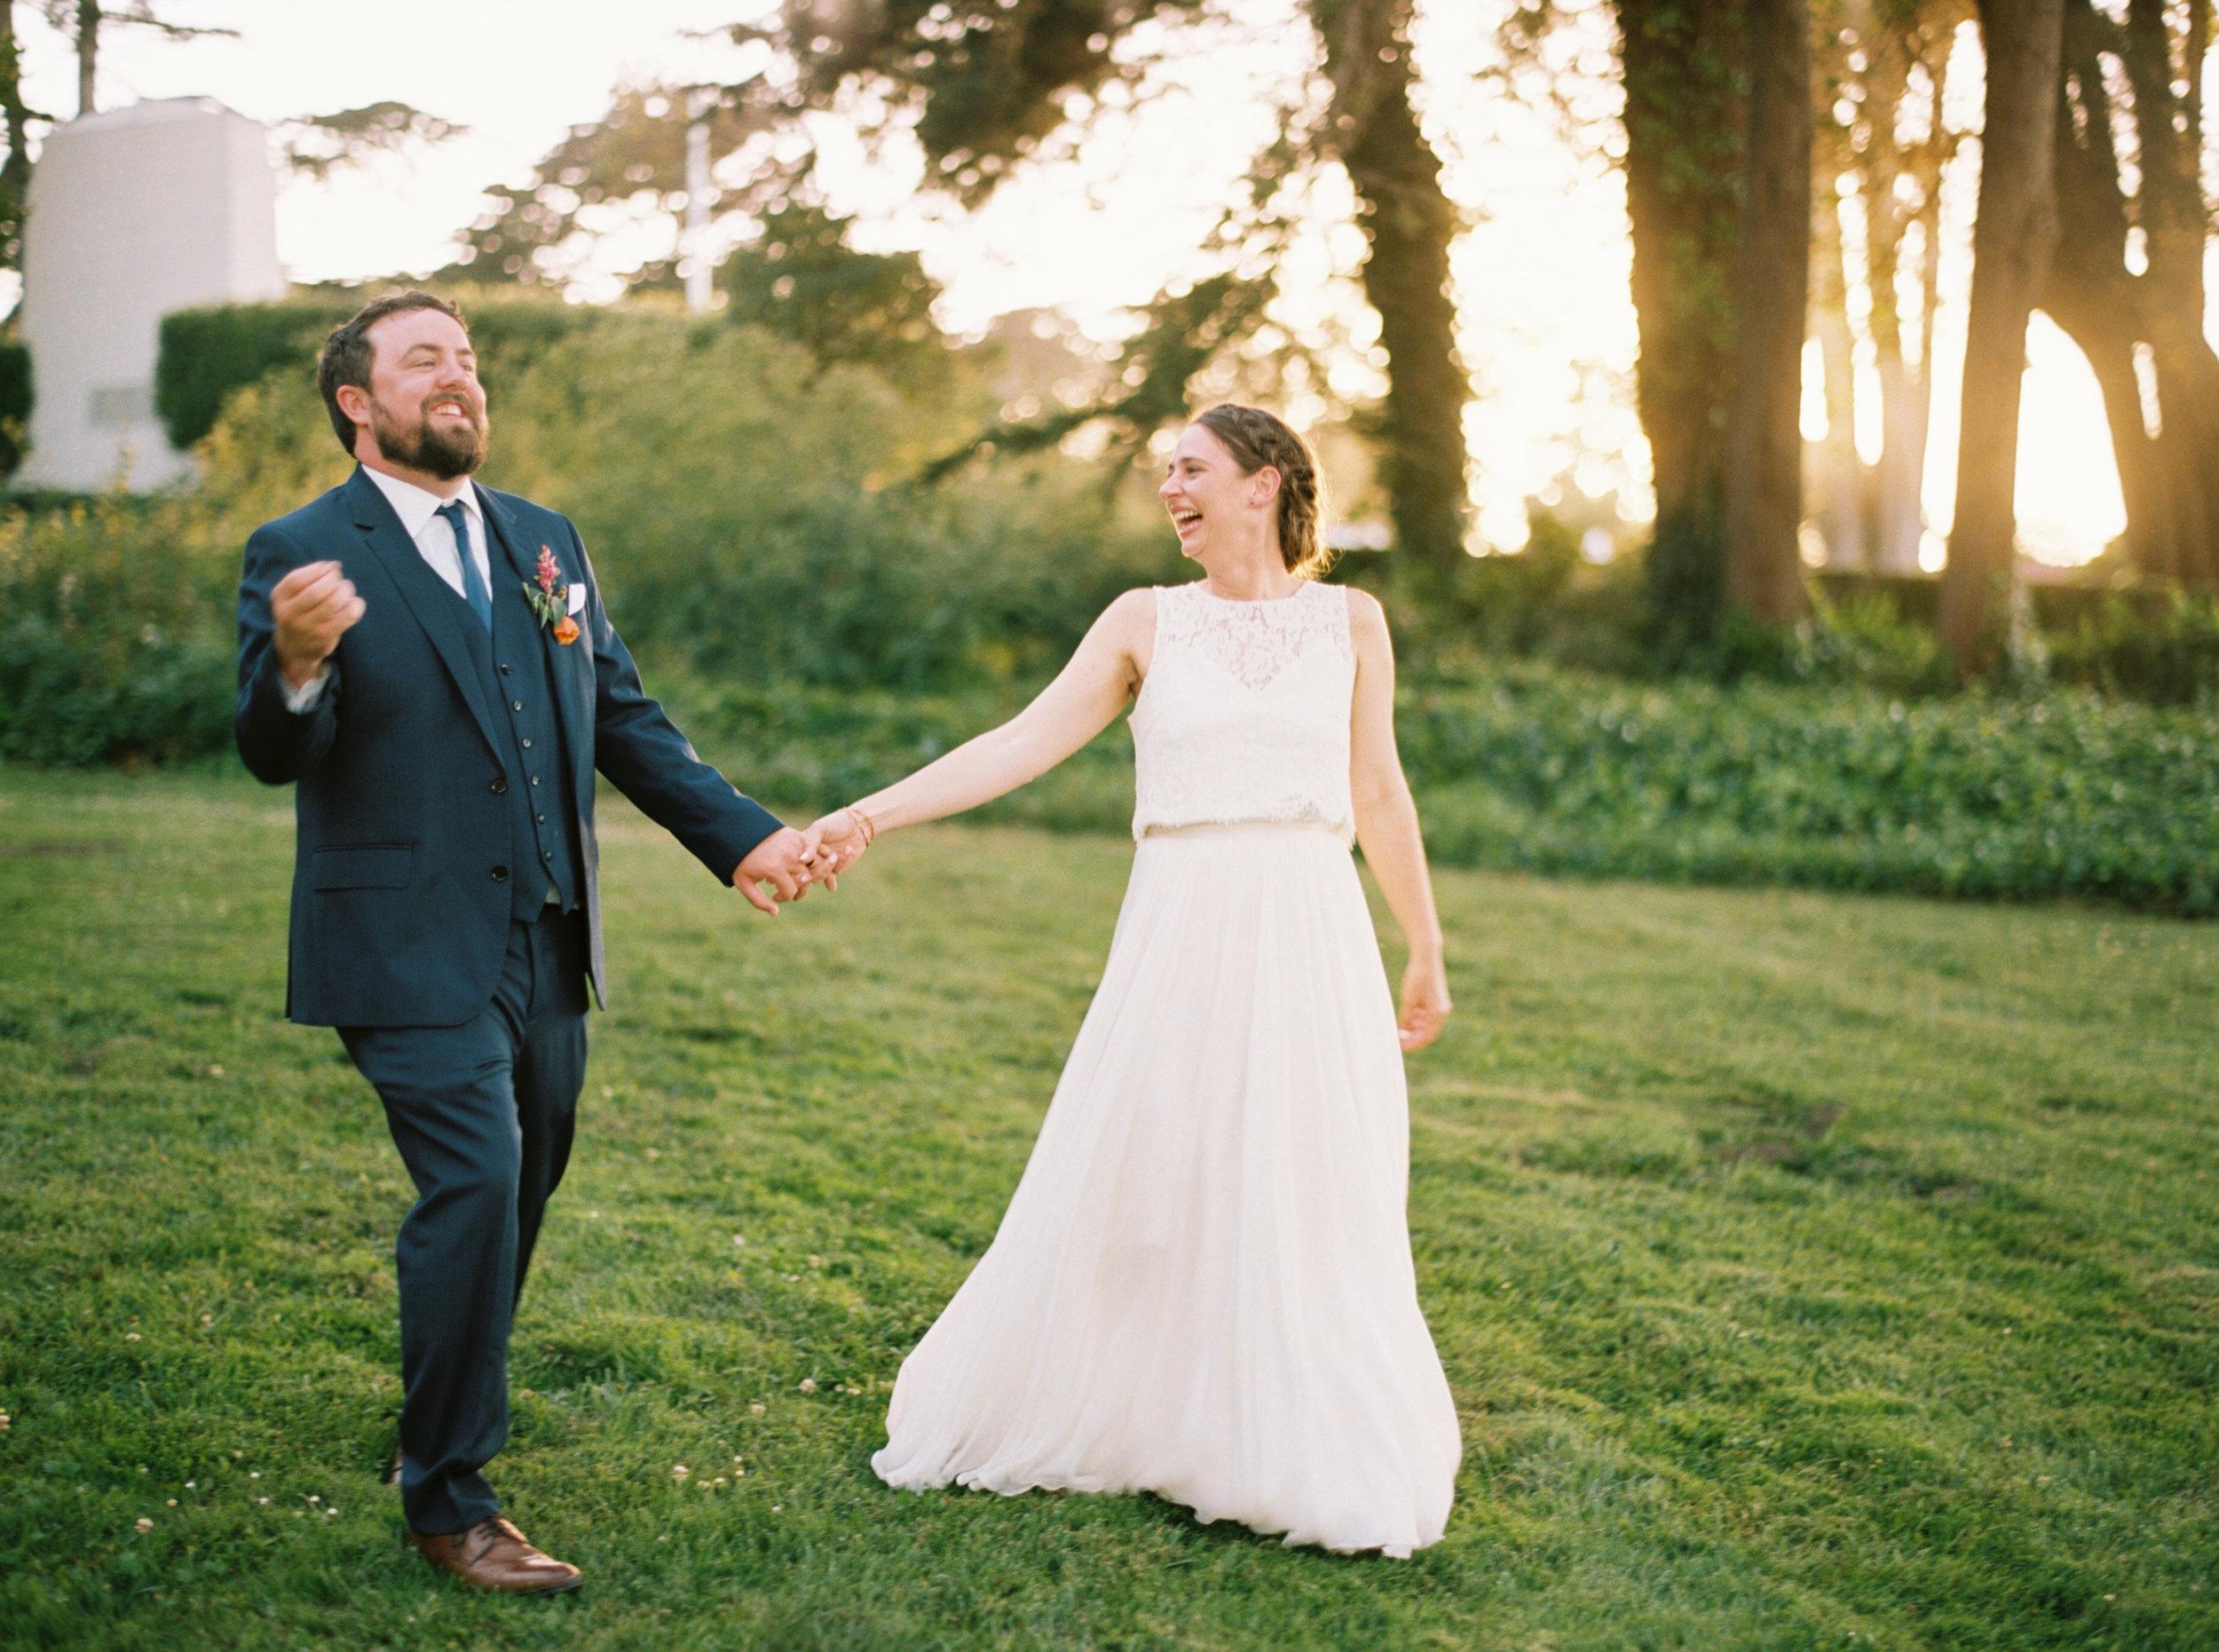 Tucker_Kristina_Wedding_Presidio_San_Francisco_Abigail_Malone_Photography-1036.jpg